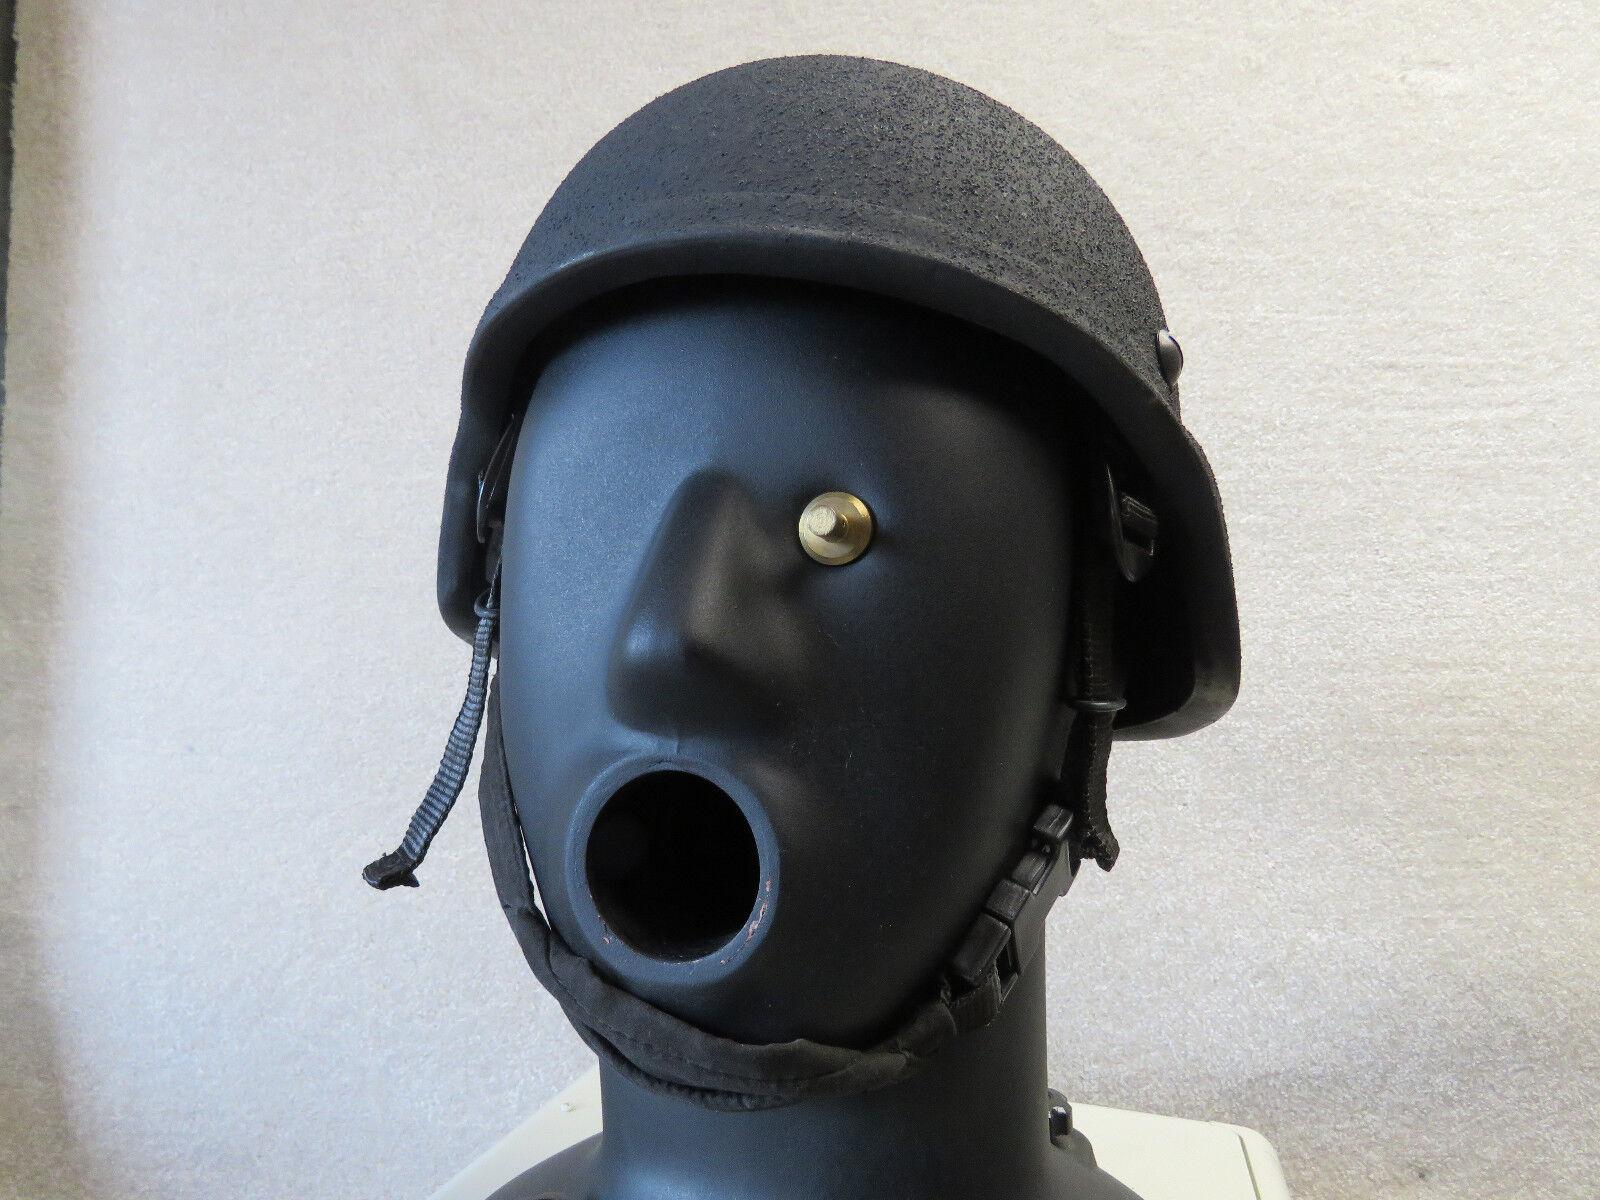 Lot of 2 ProTech Tactical Delta 4 Armored  Ballistic Helmet Level IIIA Grade B  reasonable price